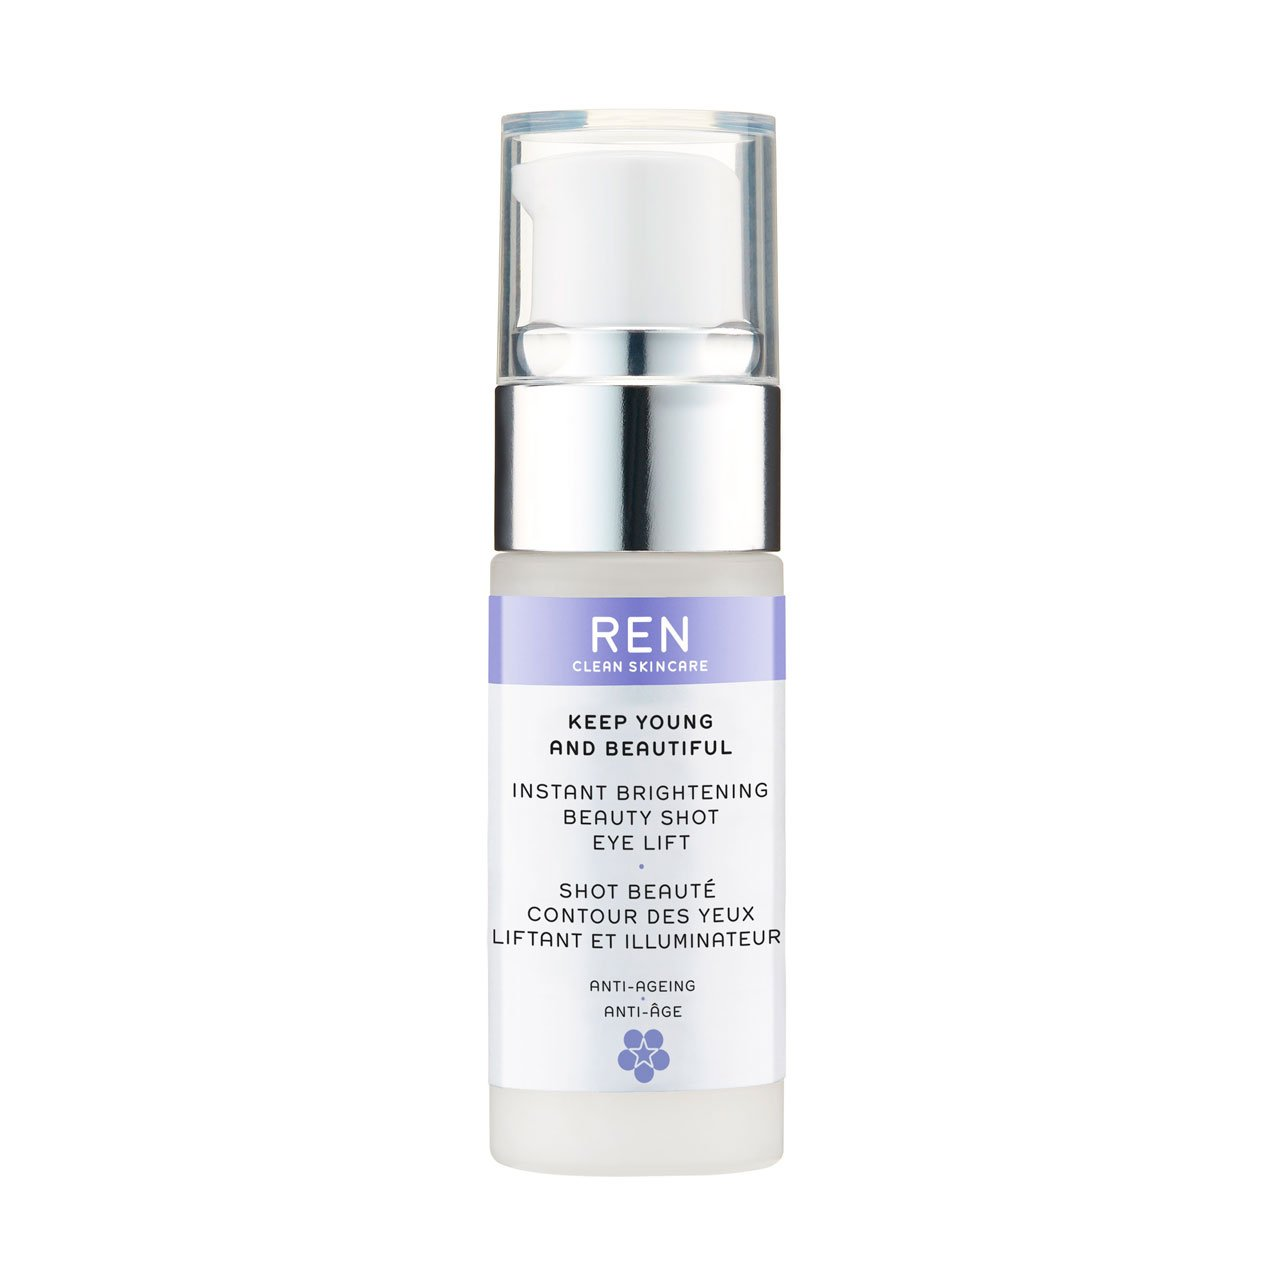 REN Keep Young and Beautiful Instant Brightening Beauty Shot Eye Lift by REN REN Ltd